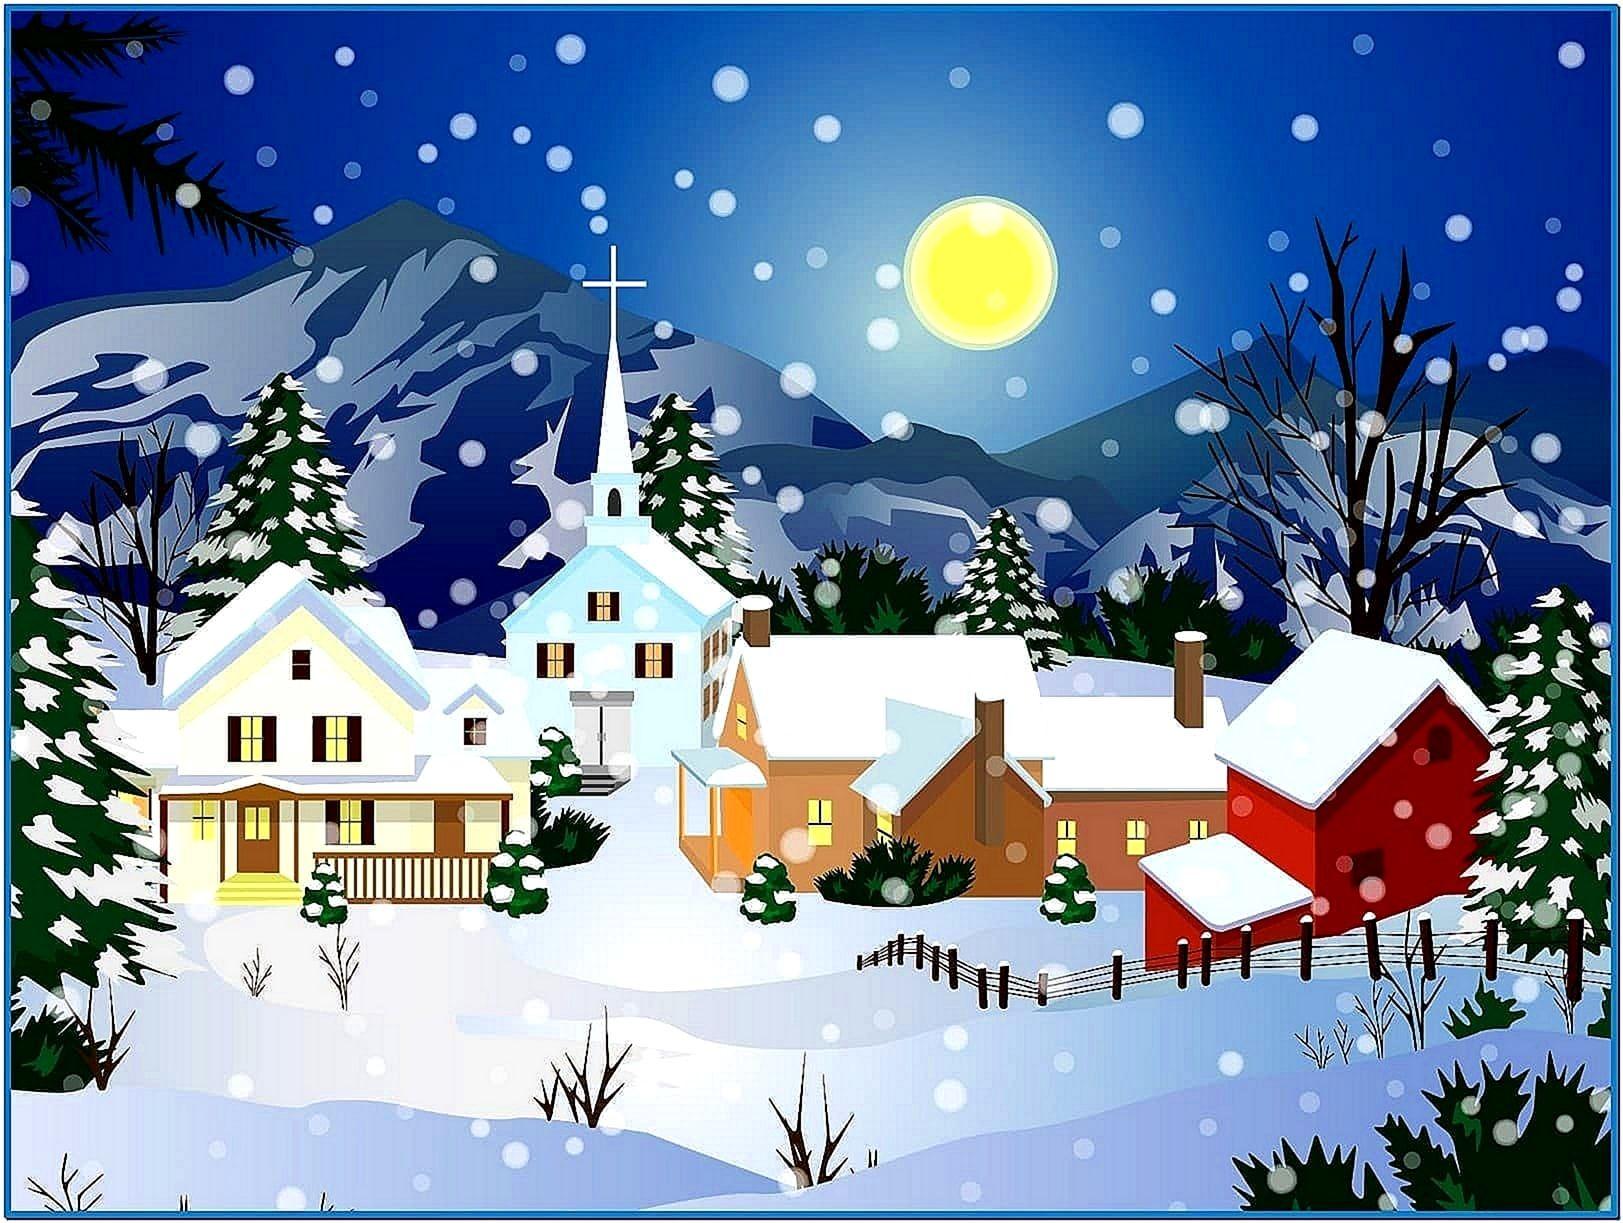 Free Animated Christmas Wallpaper Trick Gambar Selamat Natal Gambar Natal Ucapan Natal